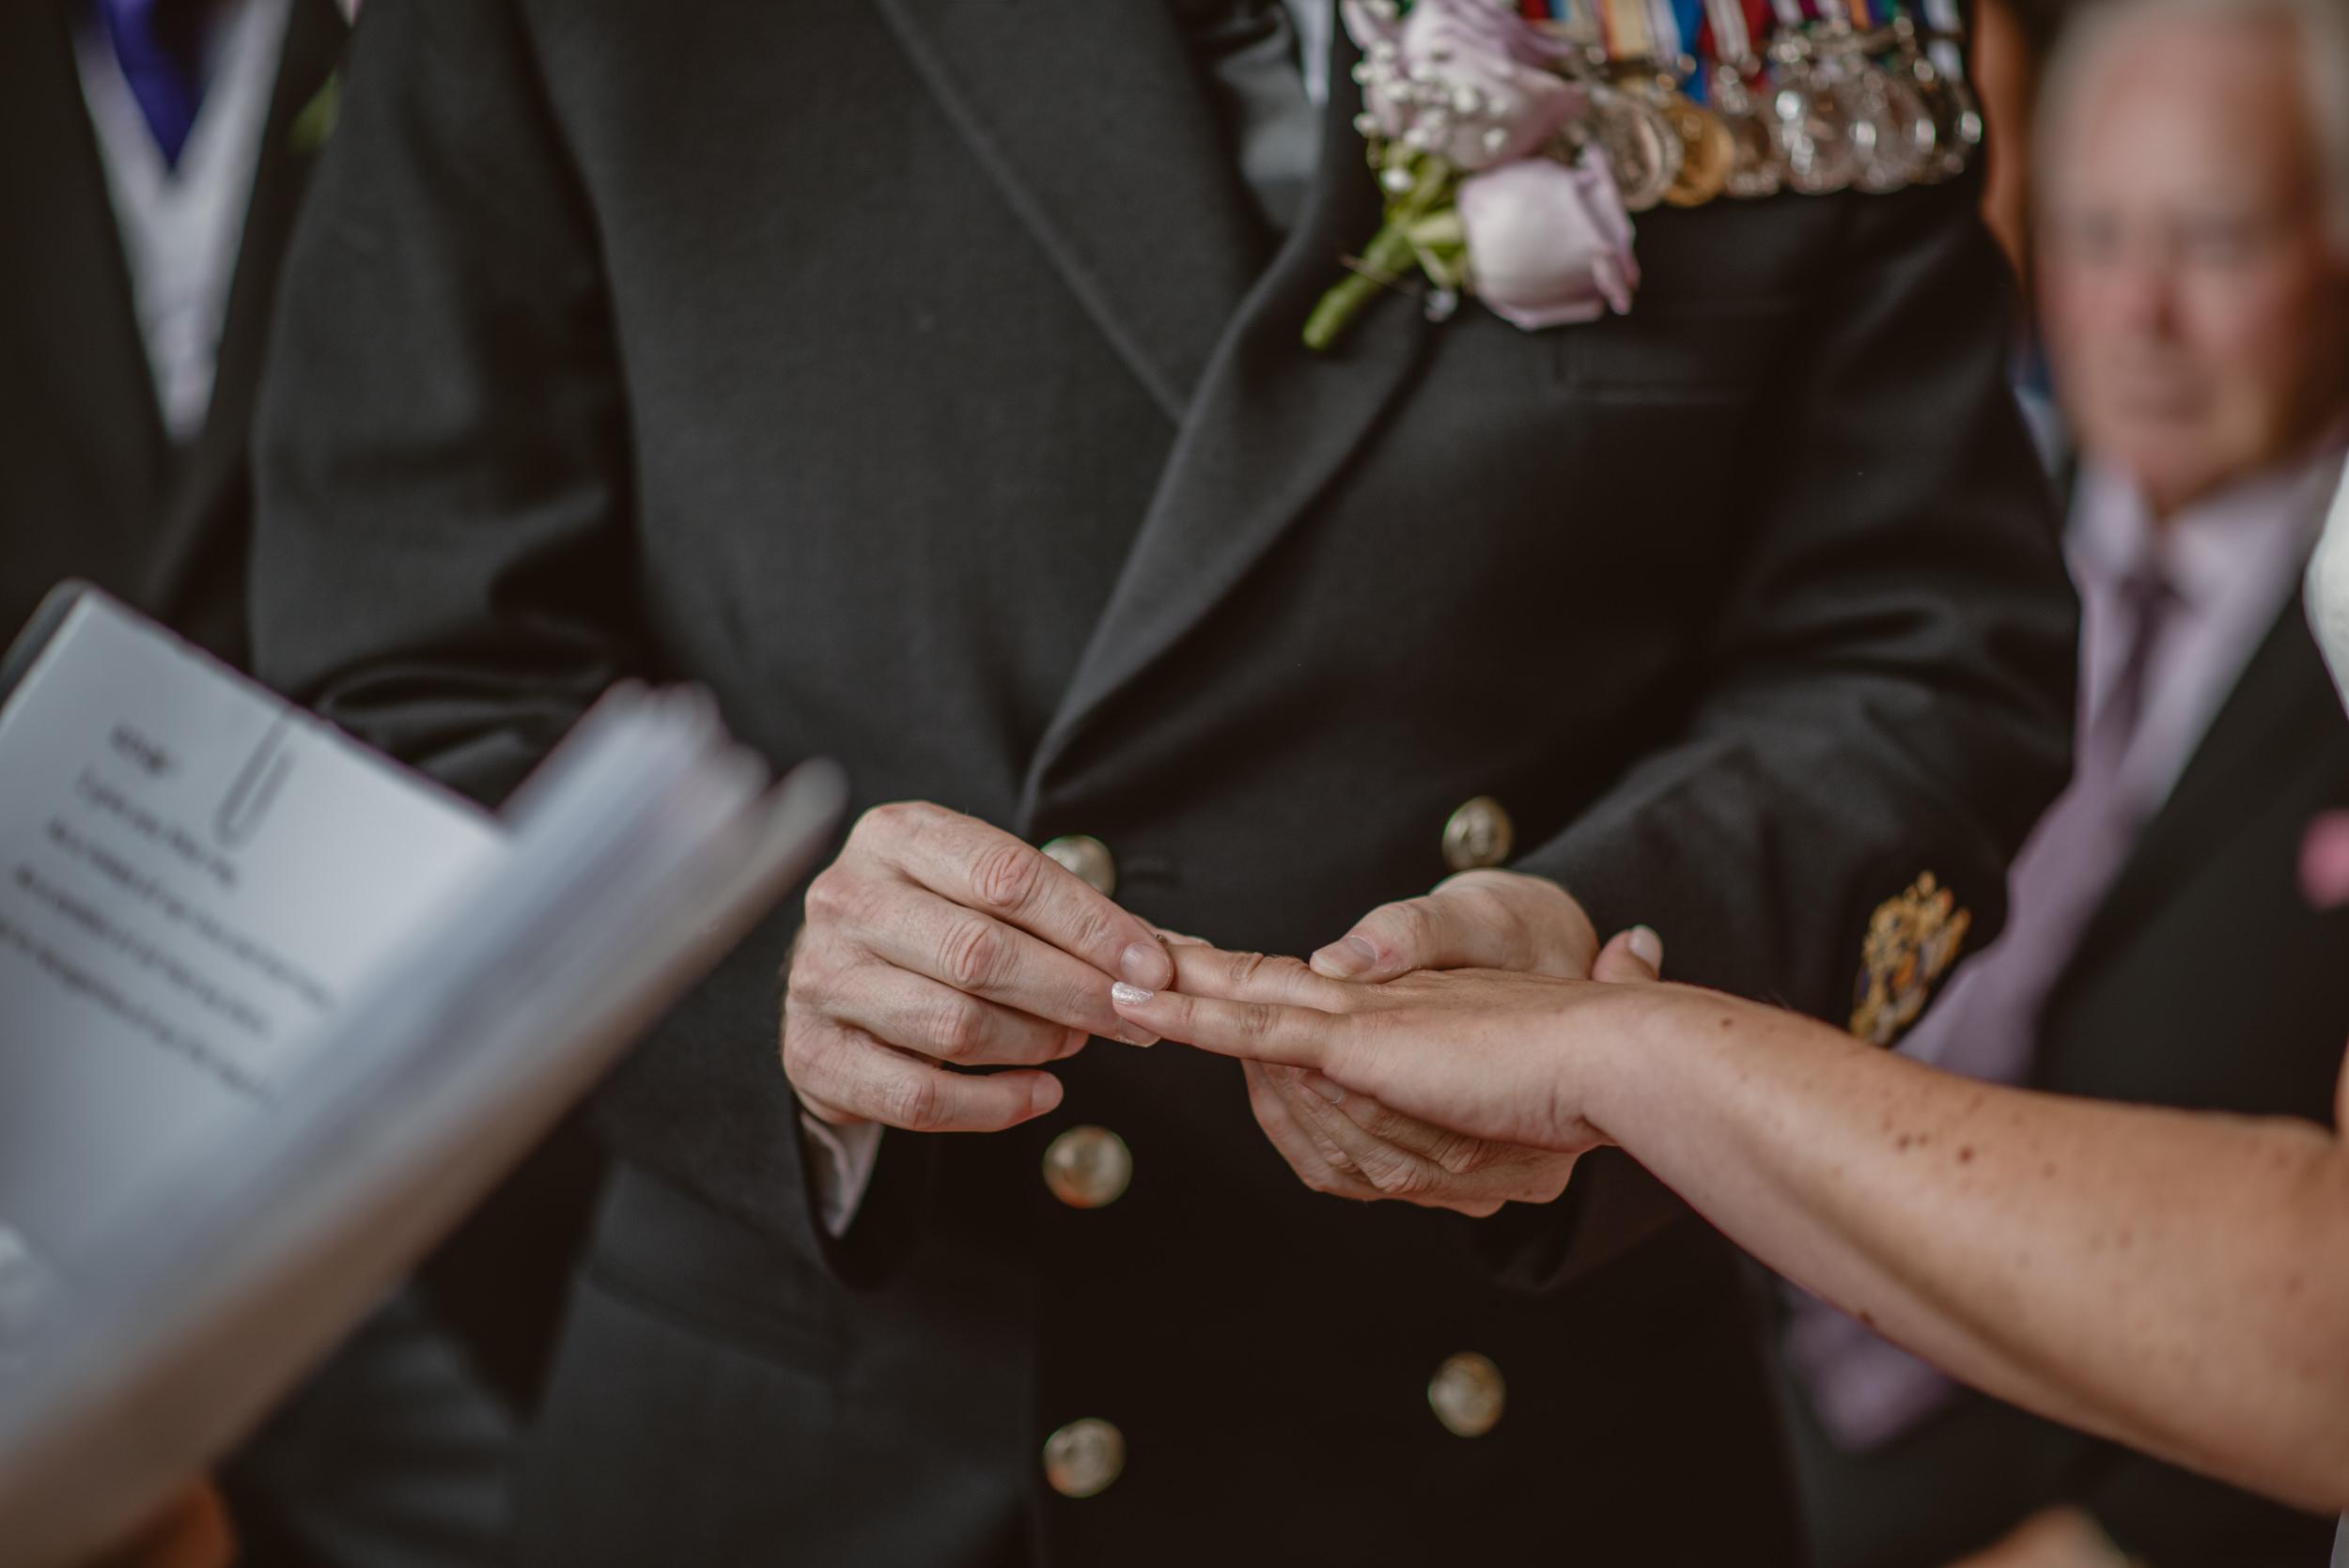 Chantelle-and-Stephen-Old-Thorns-Hotel-Wedding-Liphook-Manu-Mendoza-Wedding-Photography-219.jpg